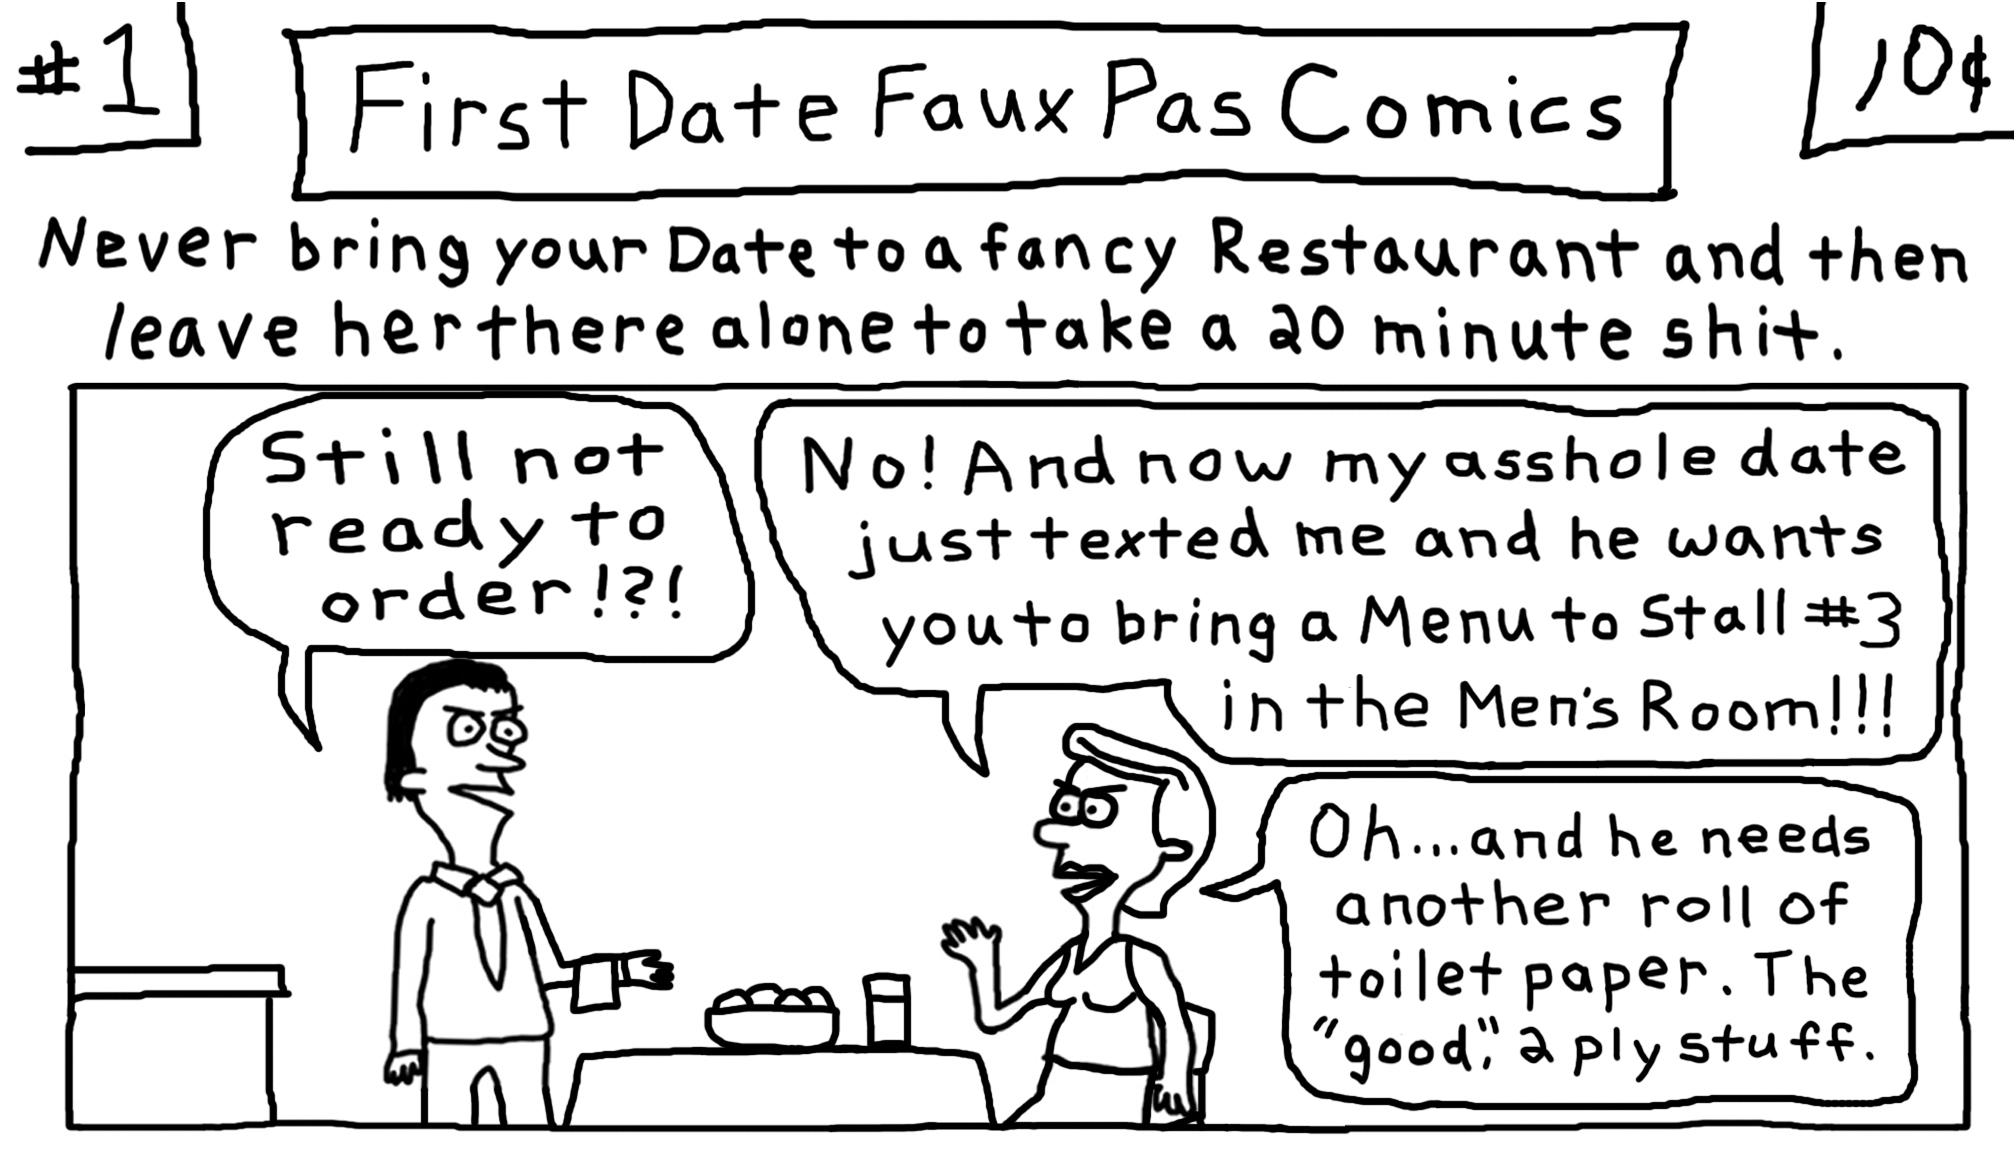 You're Bad at Dating Comics